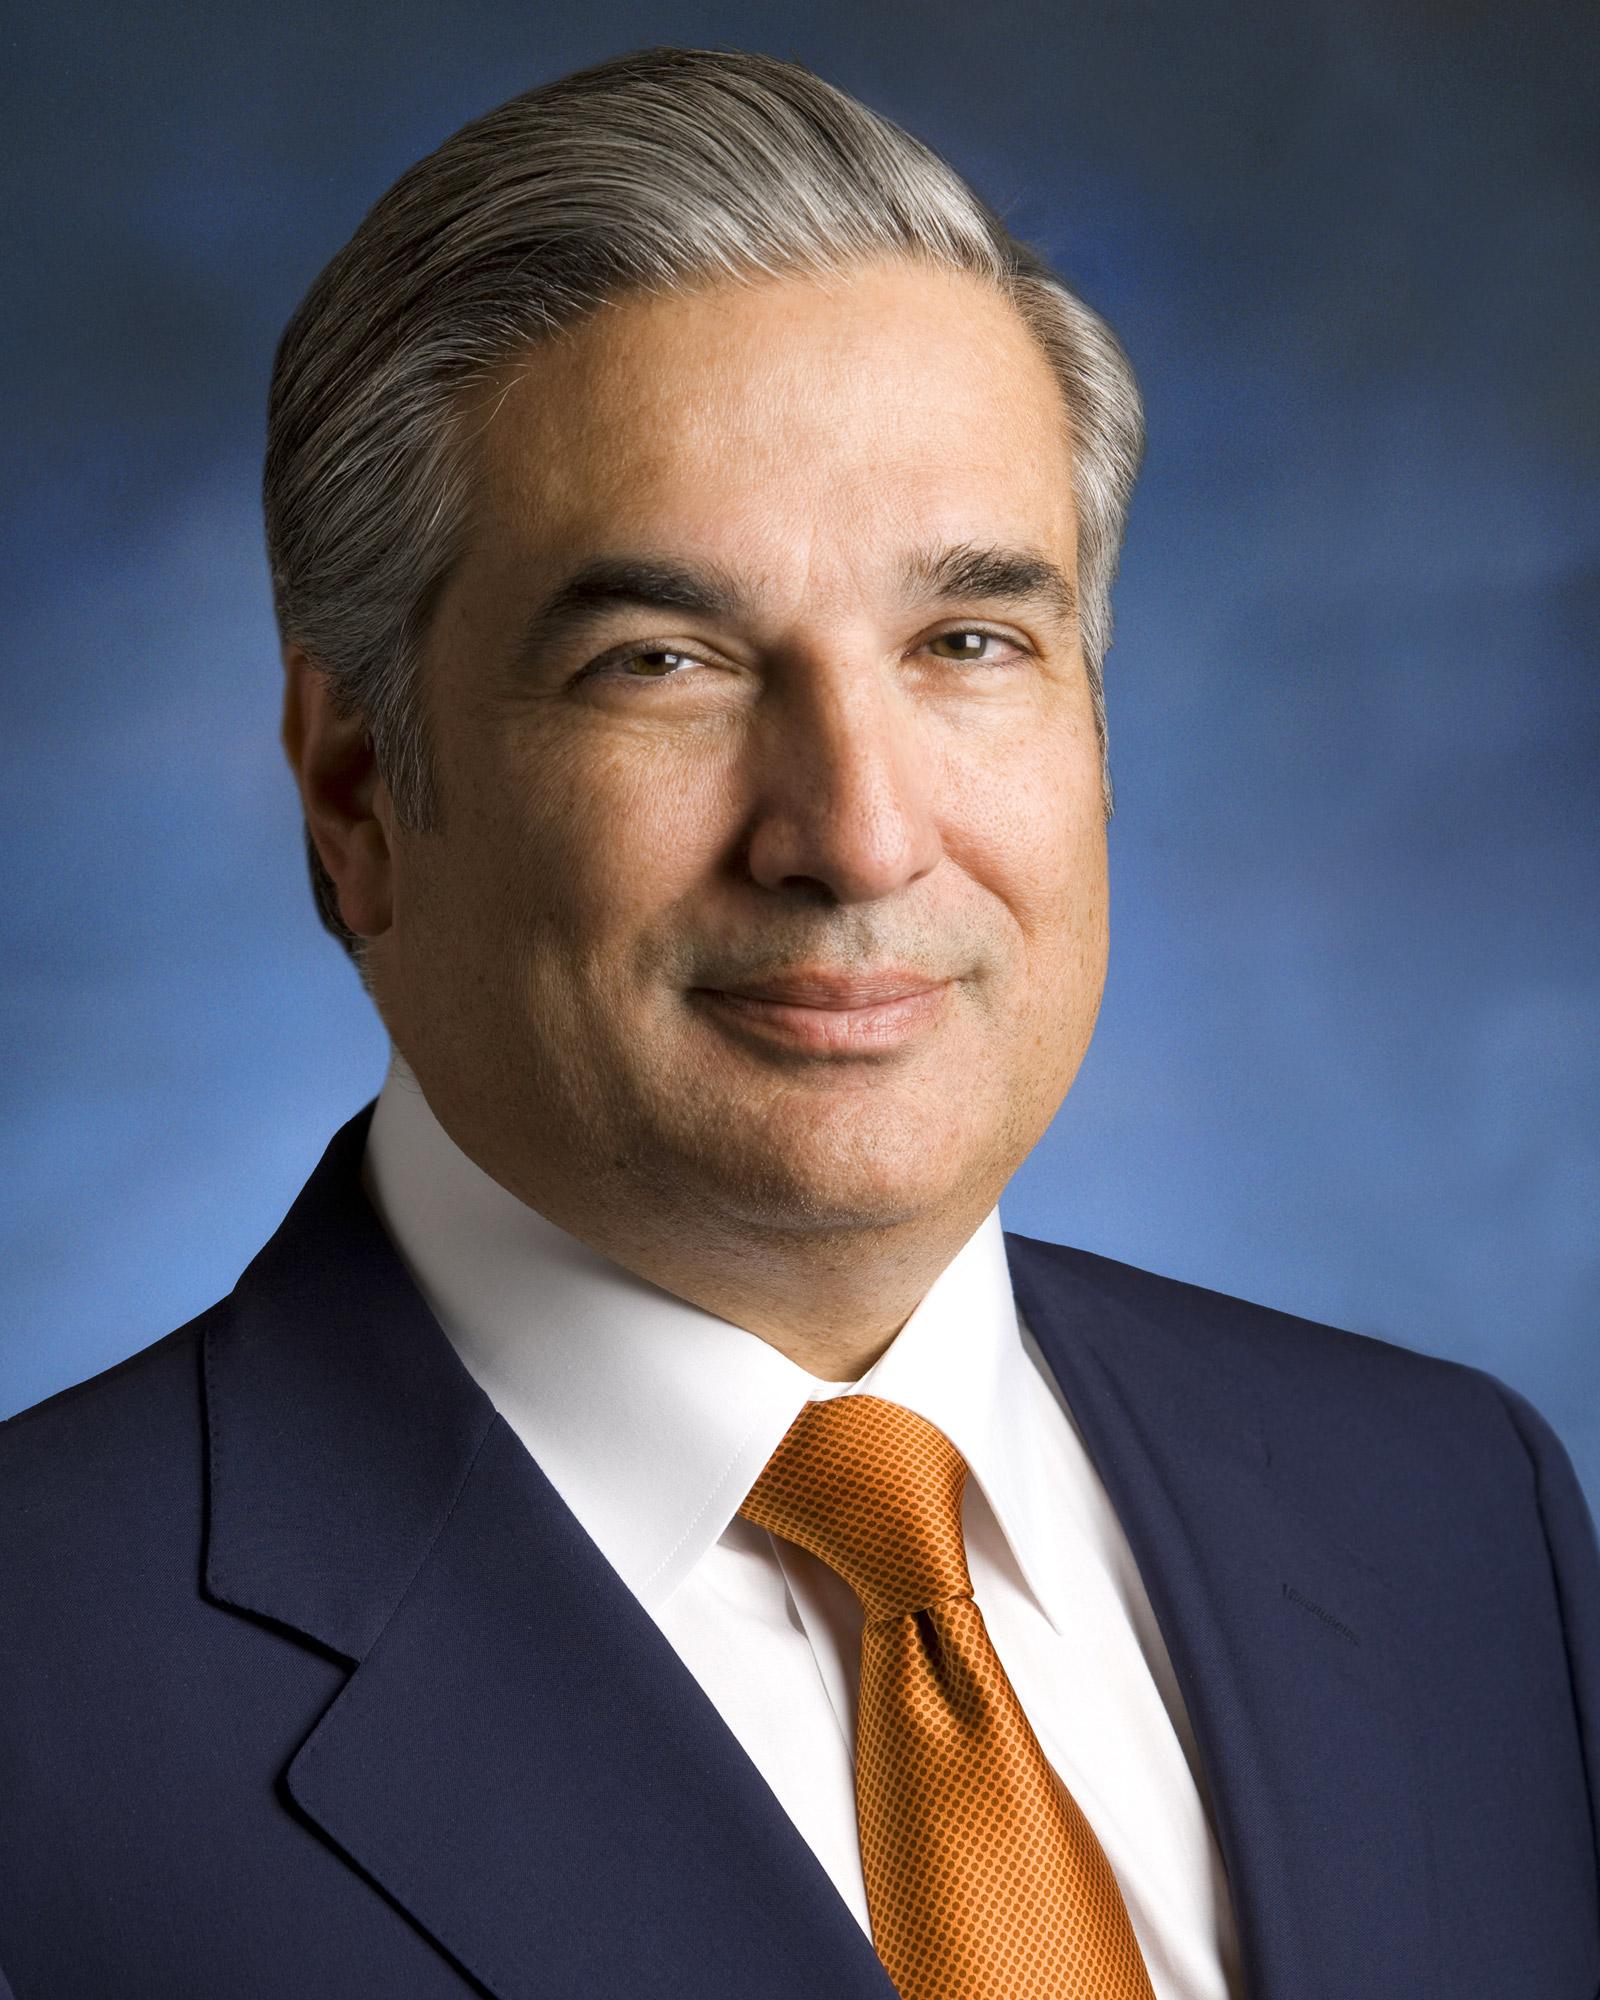 Chancellor Francisco G. Cigarroa, M.D.